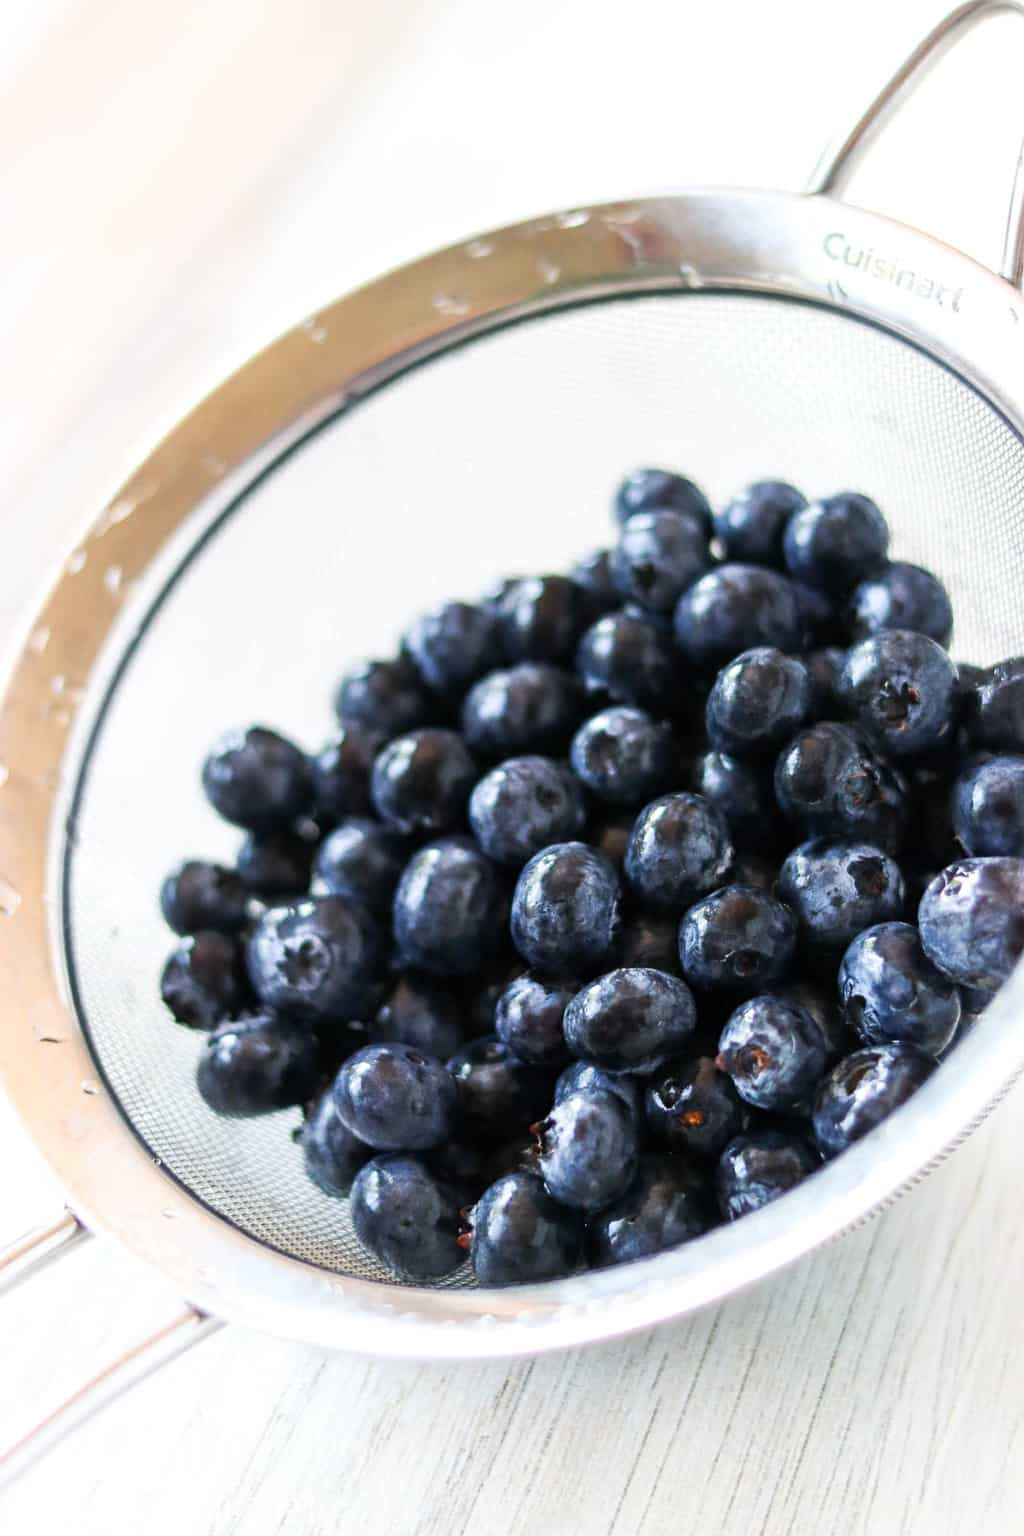 A strainer basket of blueberries